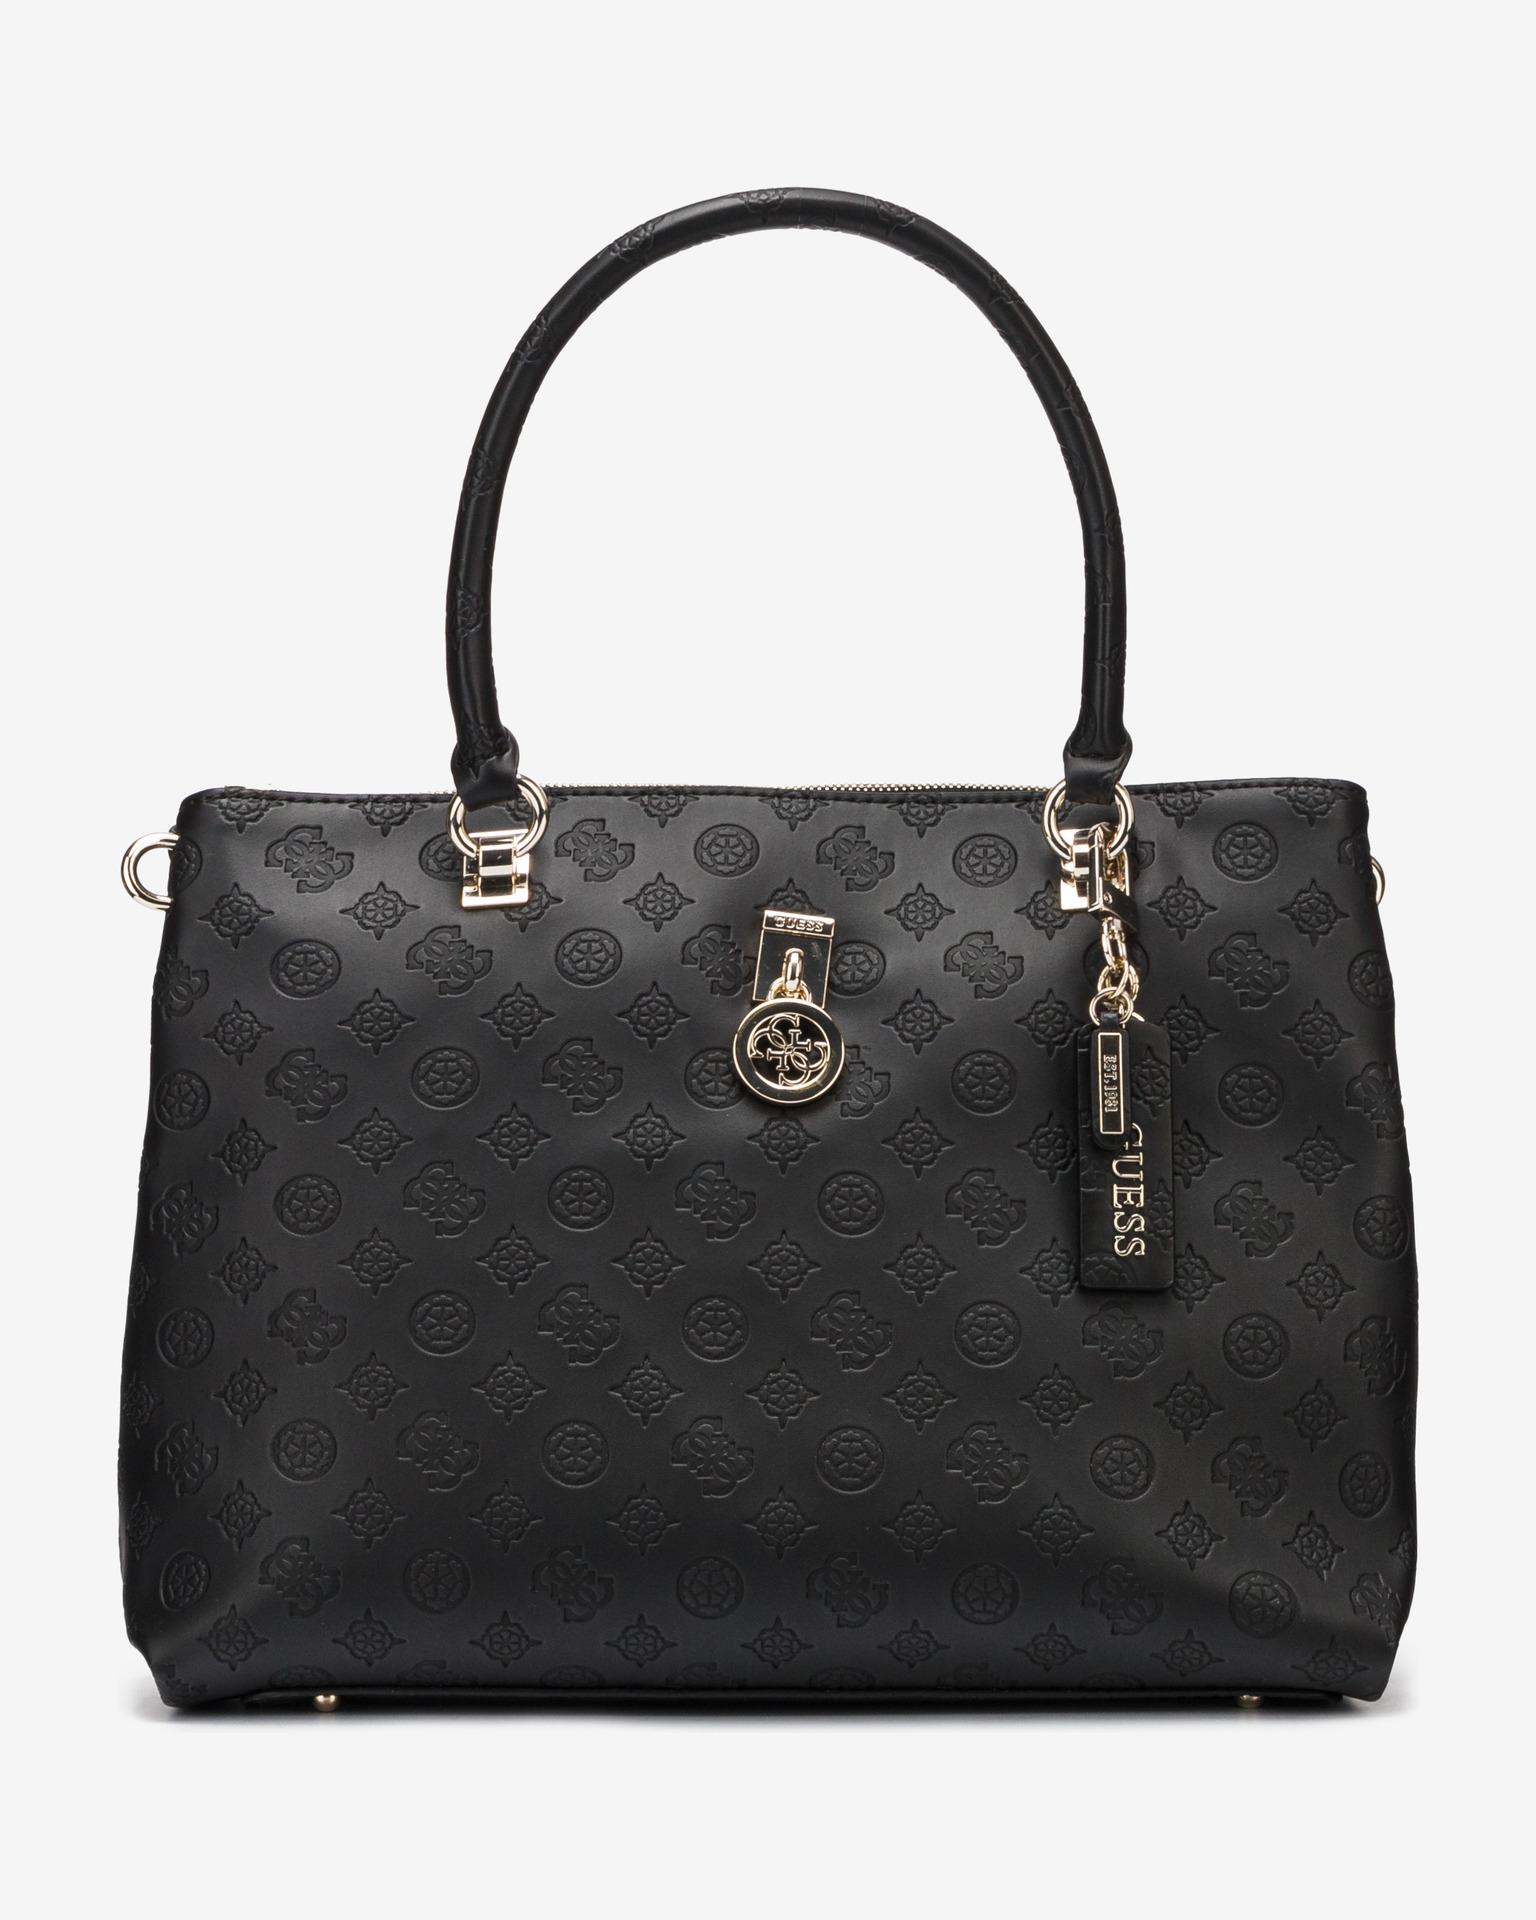 Guess black handbag Ninnette Satus Carryall